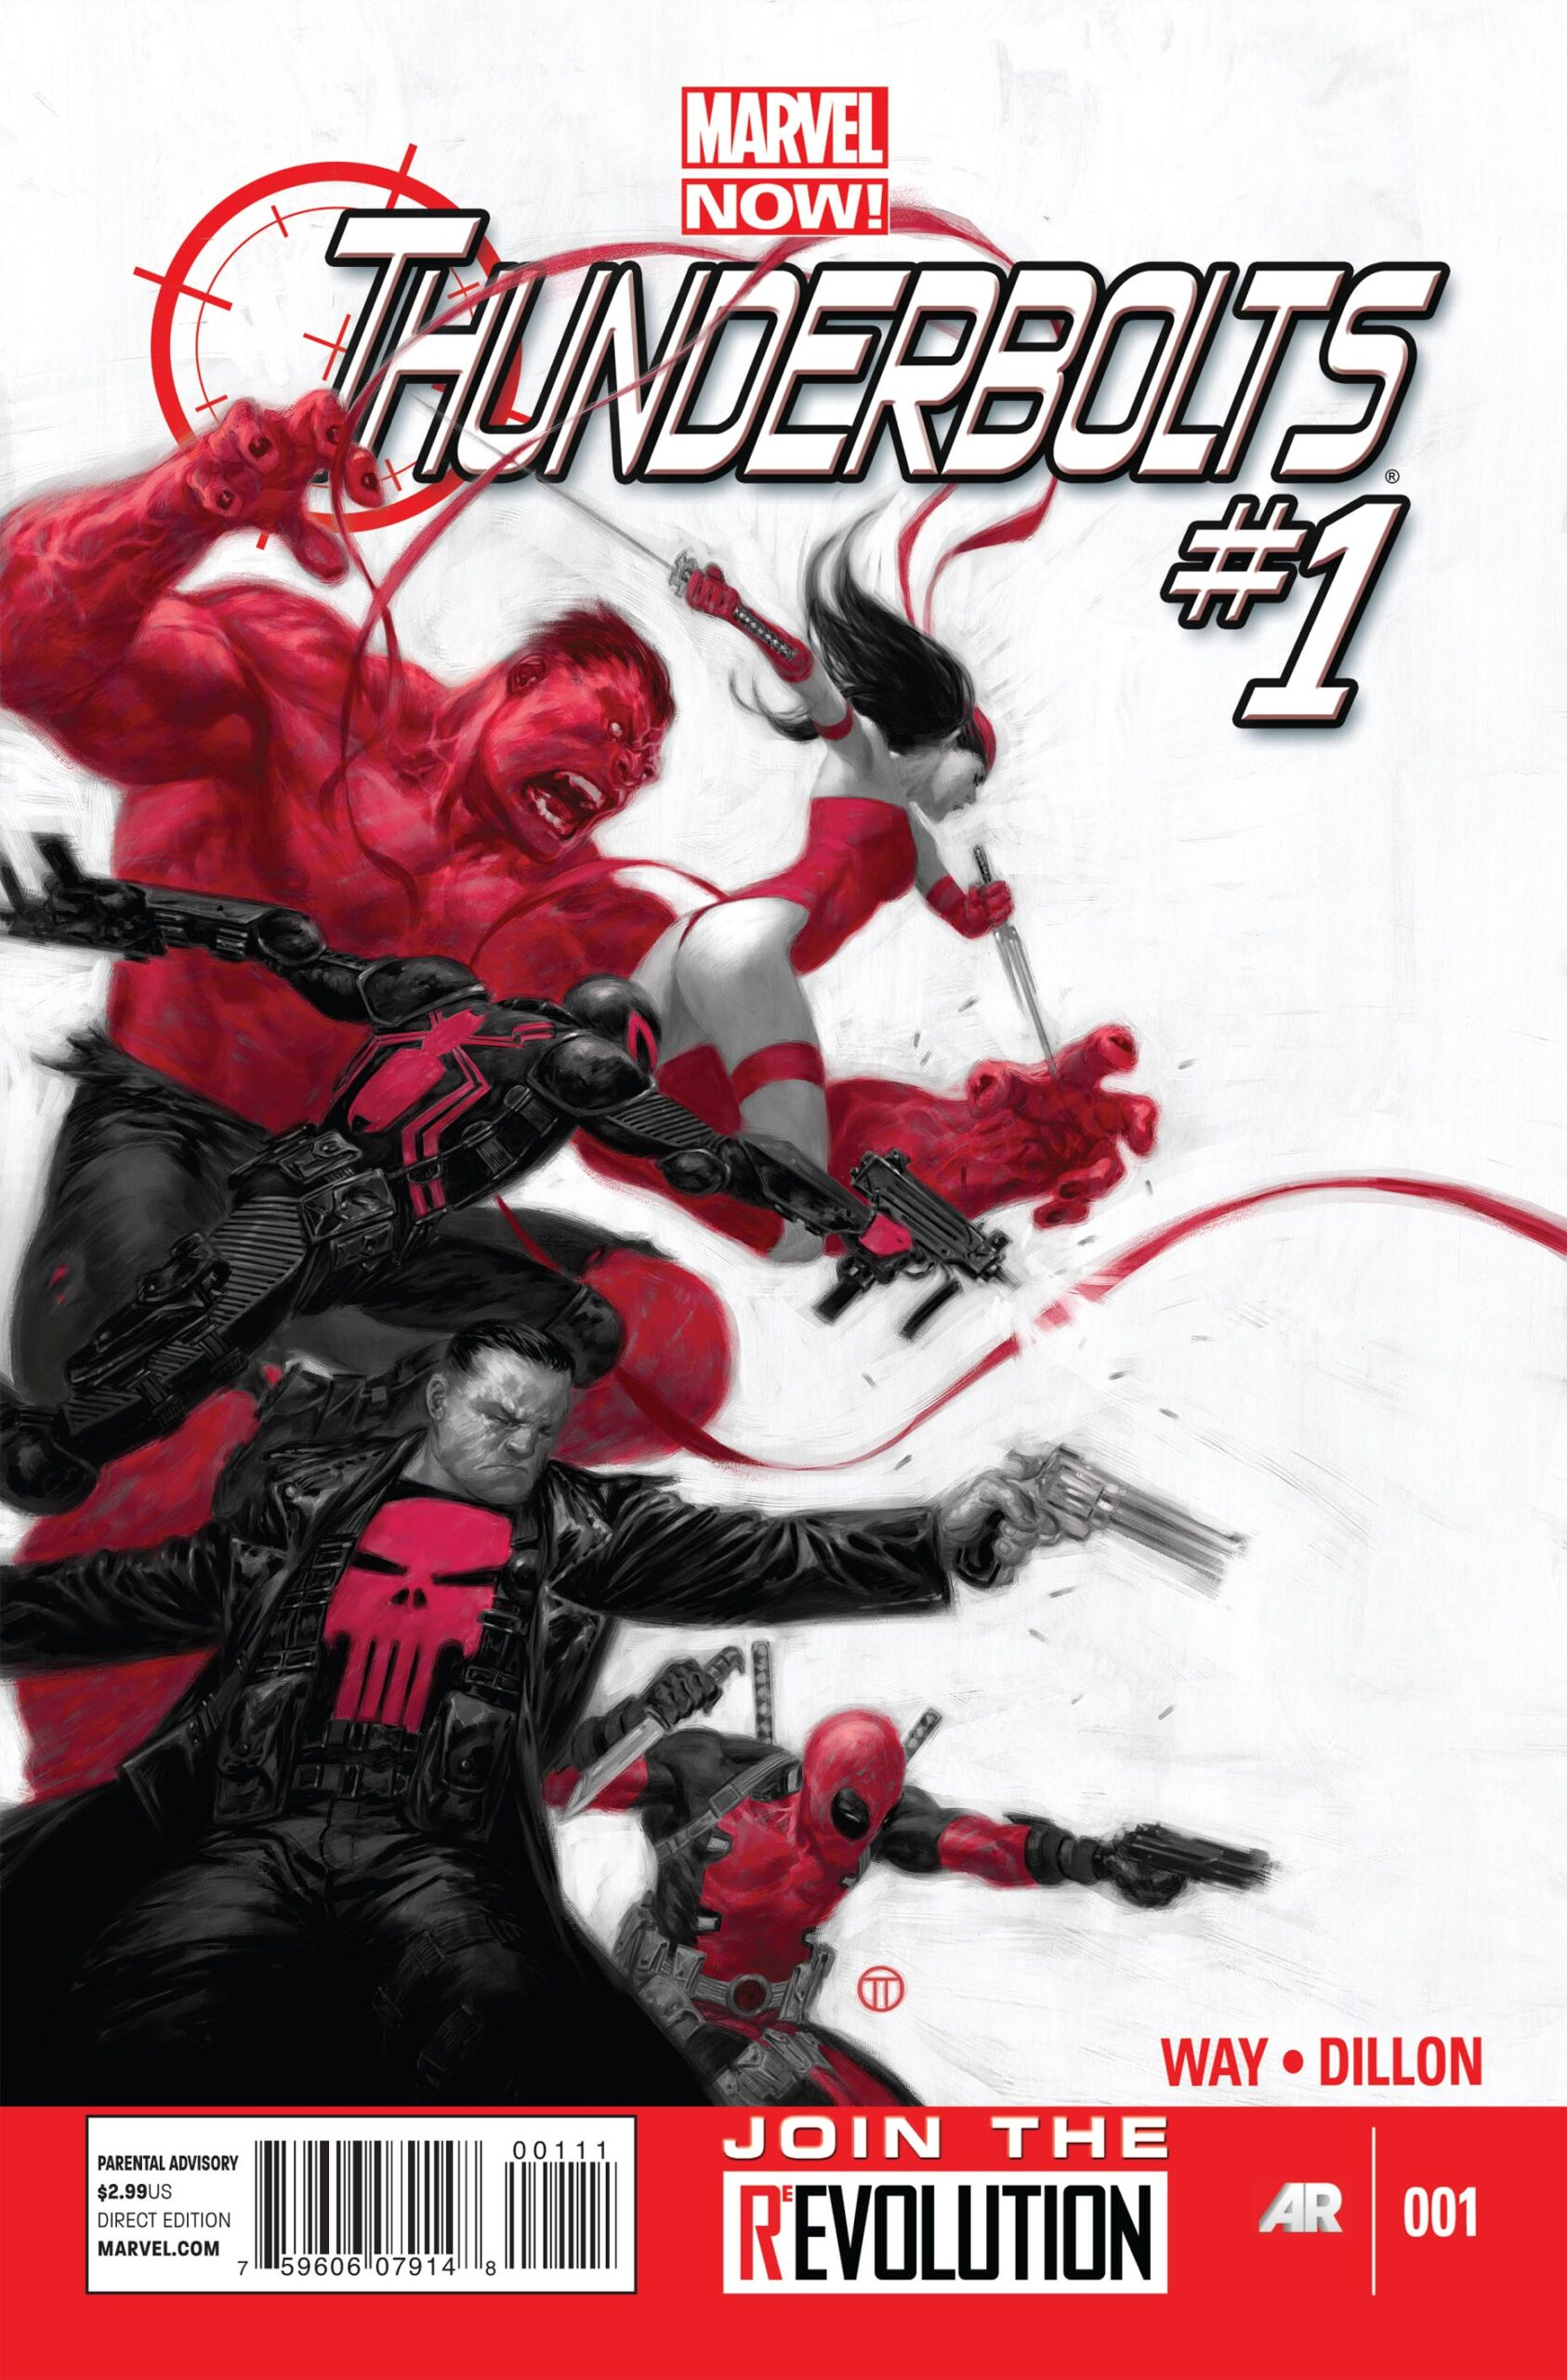 Marvel NOW! Presents Thunderbolt's Thunderbolts!